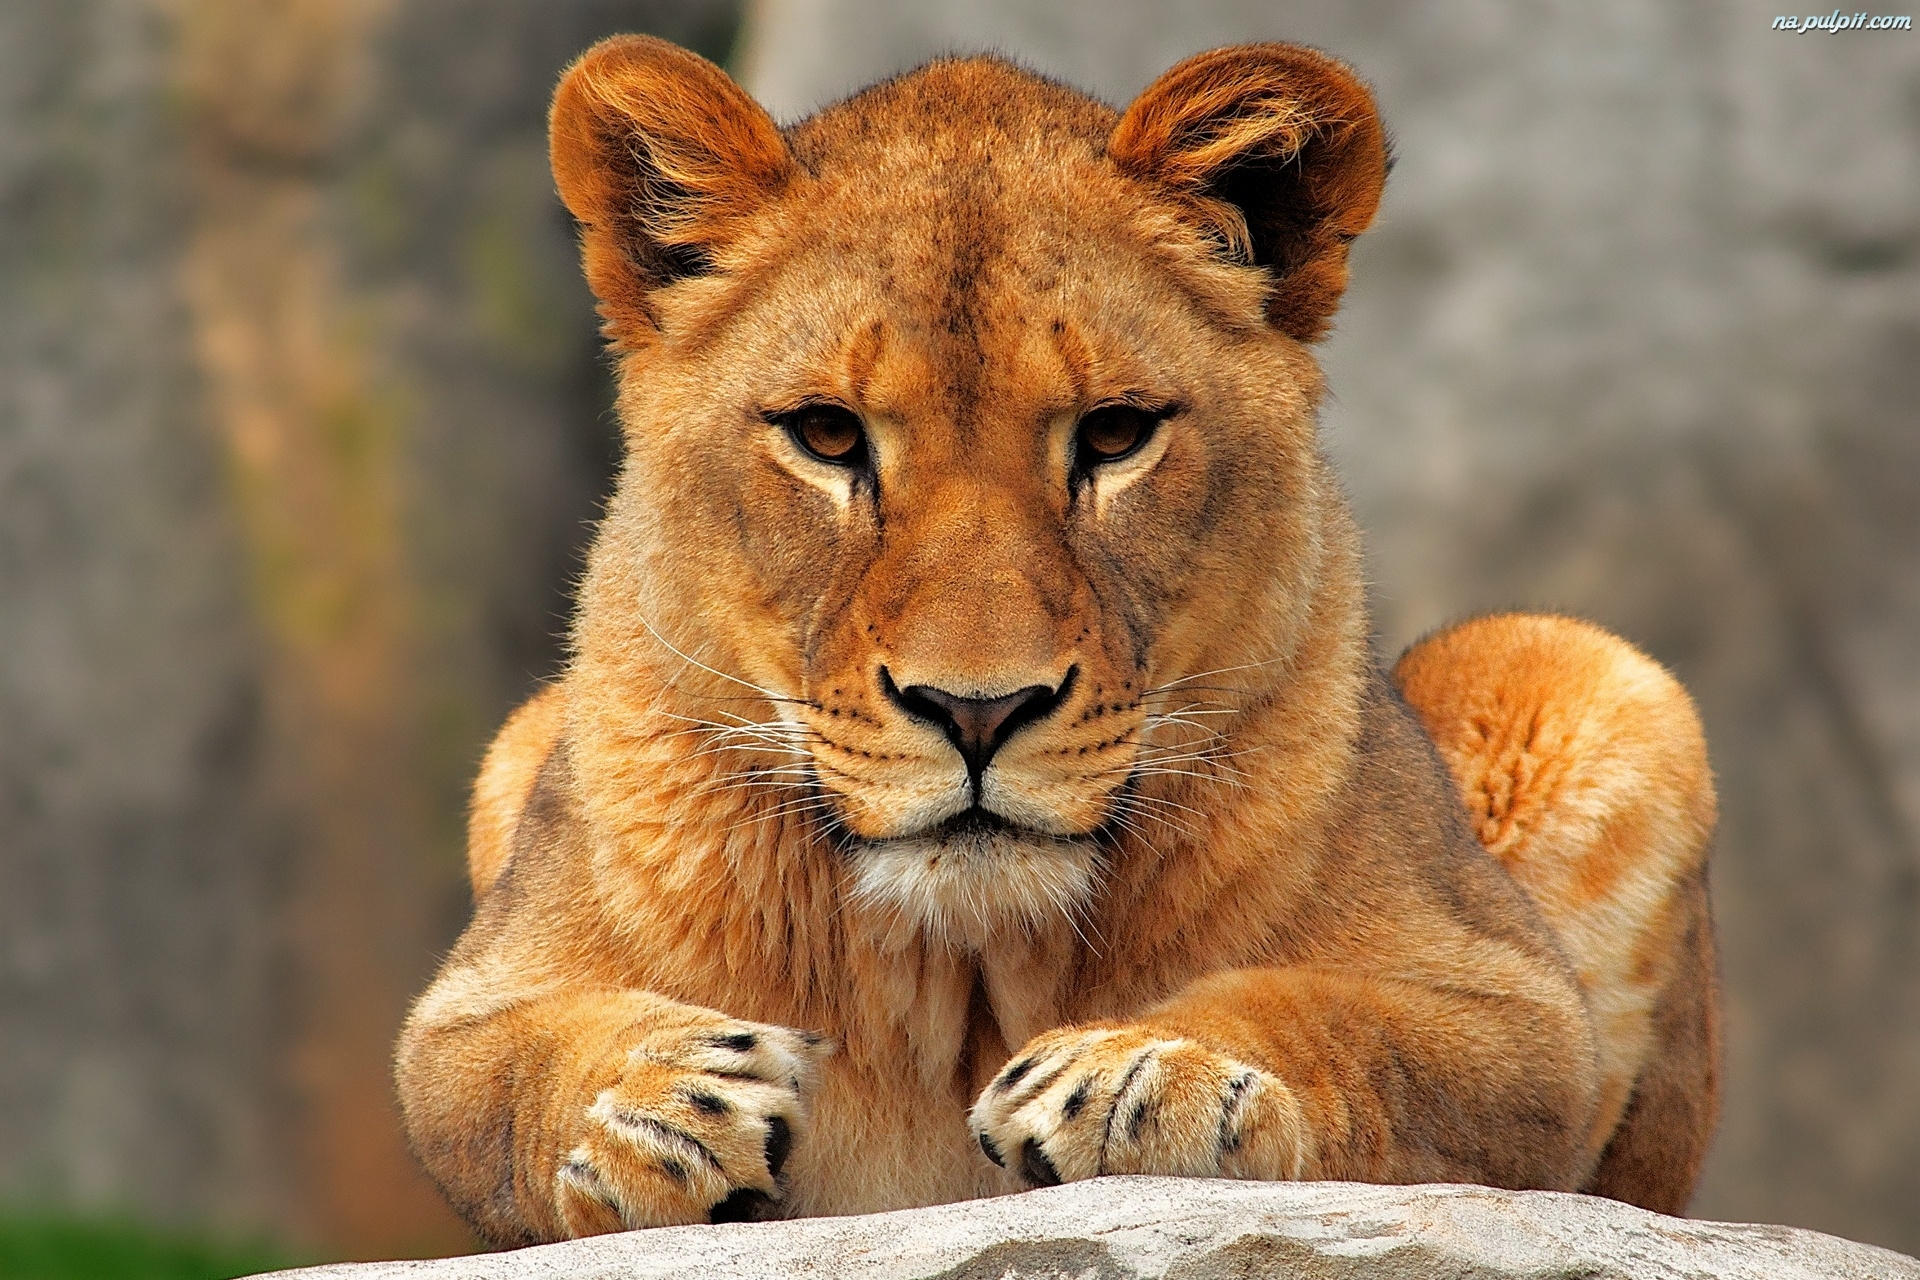 lion animal brown 1366x768 - photo #13